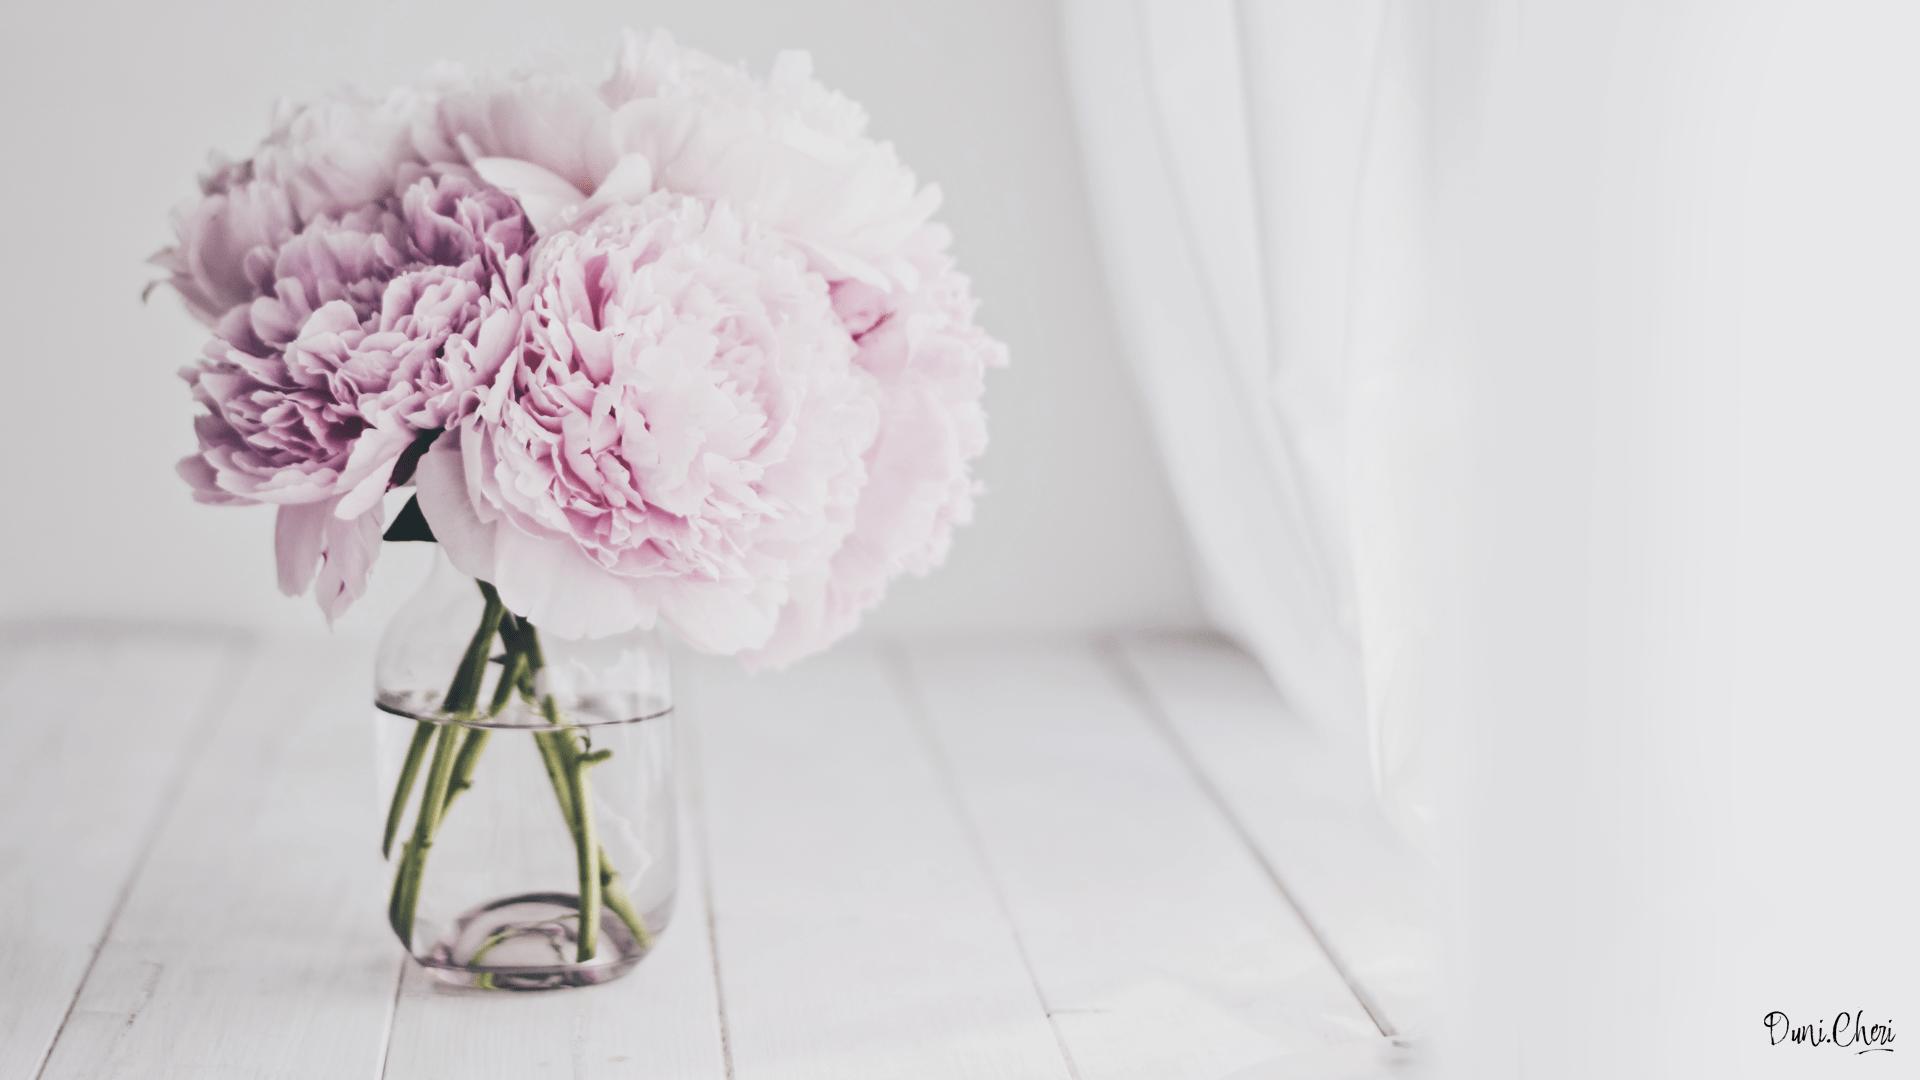 Cherry Blossom Wallpaper Hd Free Download Spring Flower Wallpaper Kostenlose